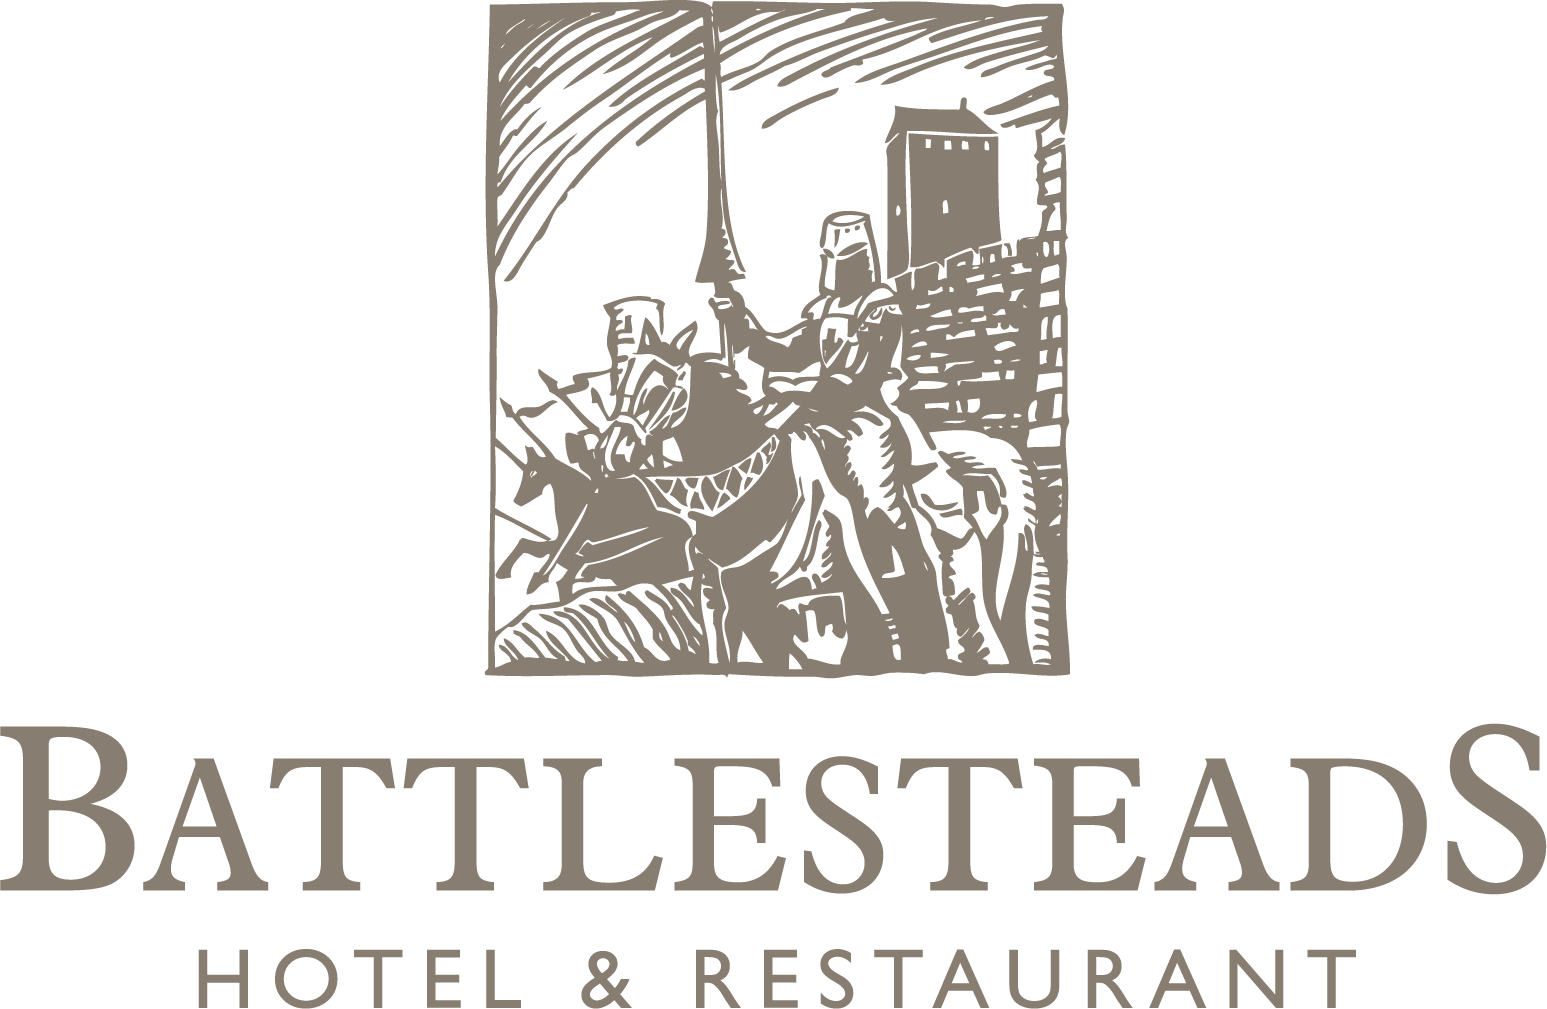 Battlesteads Hotel & Restaurant Logo